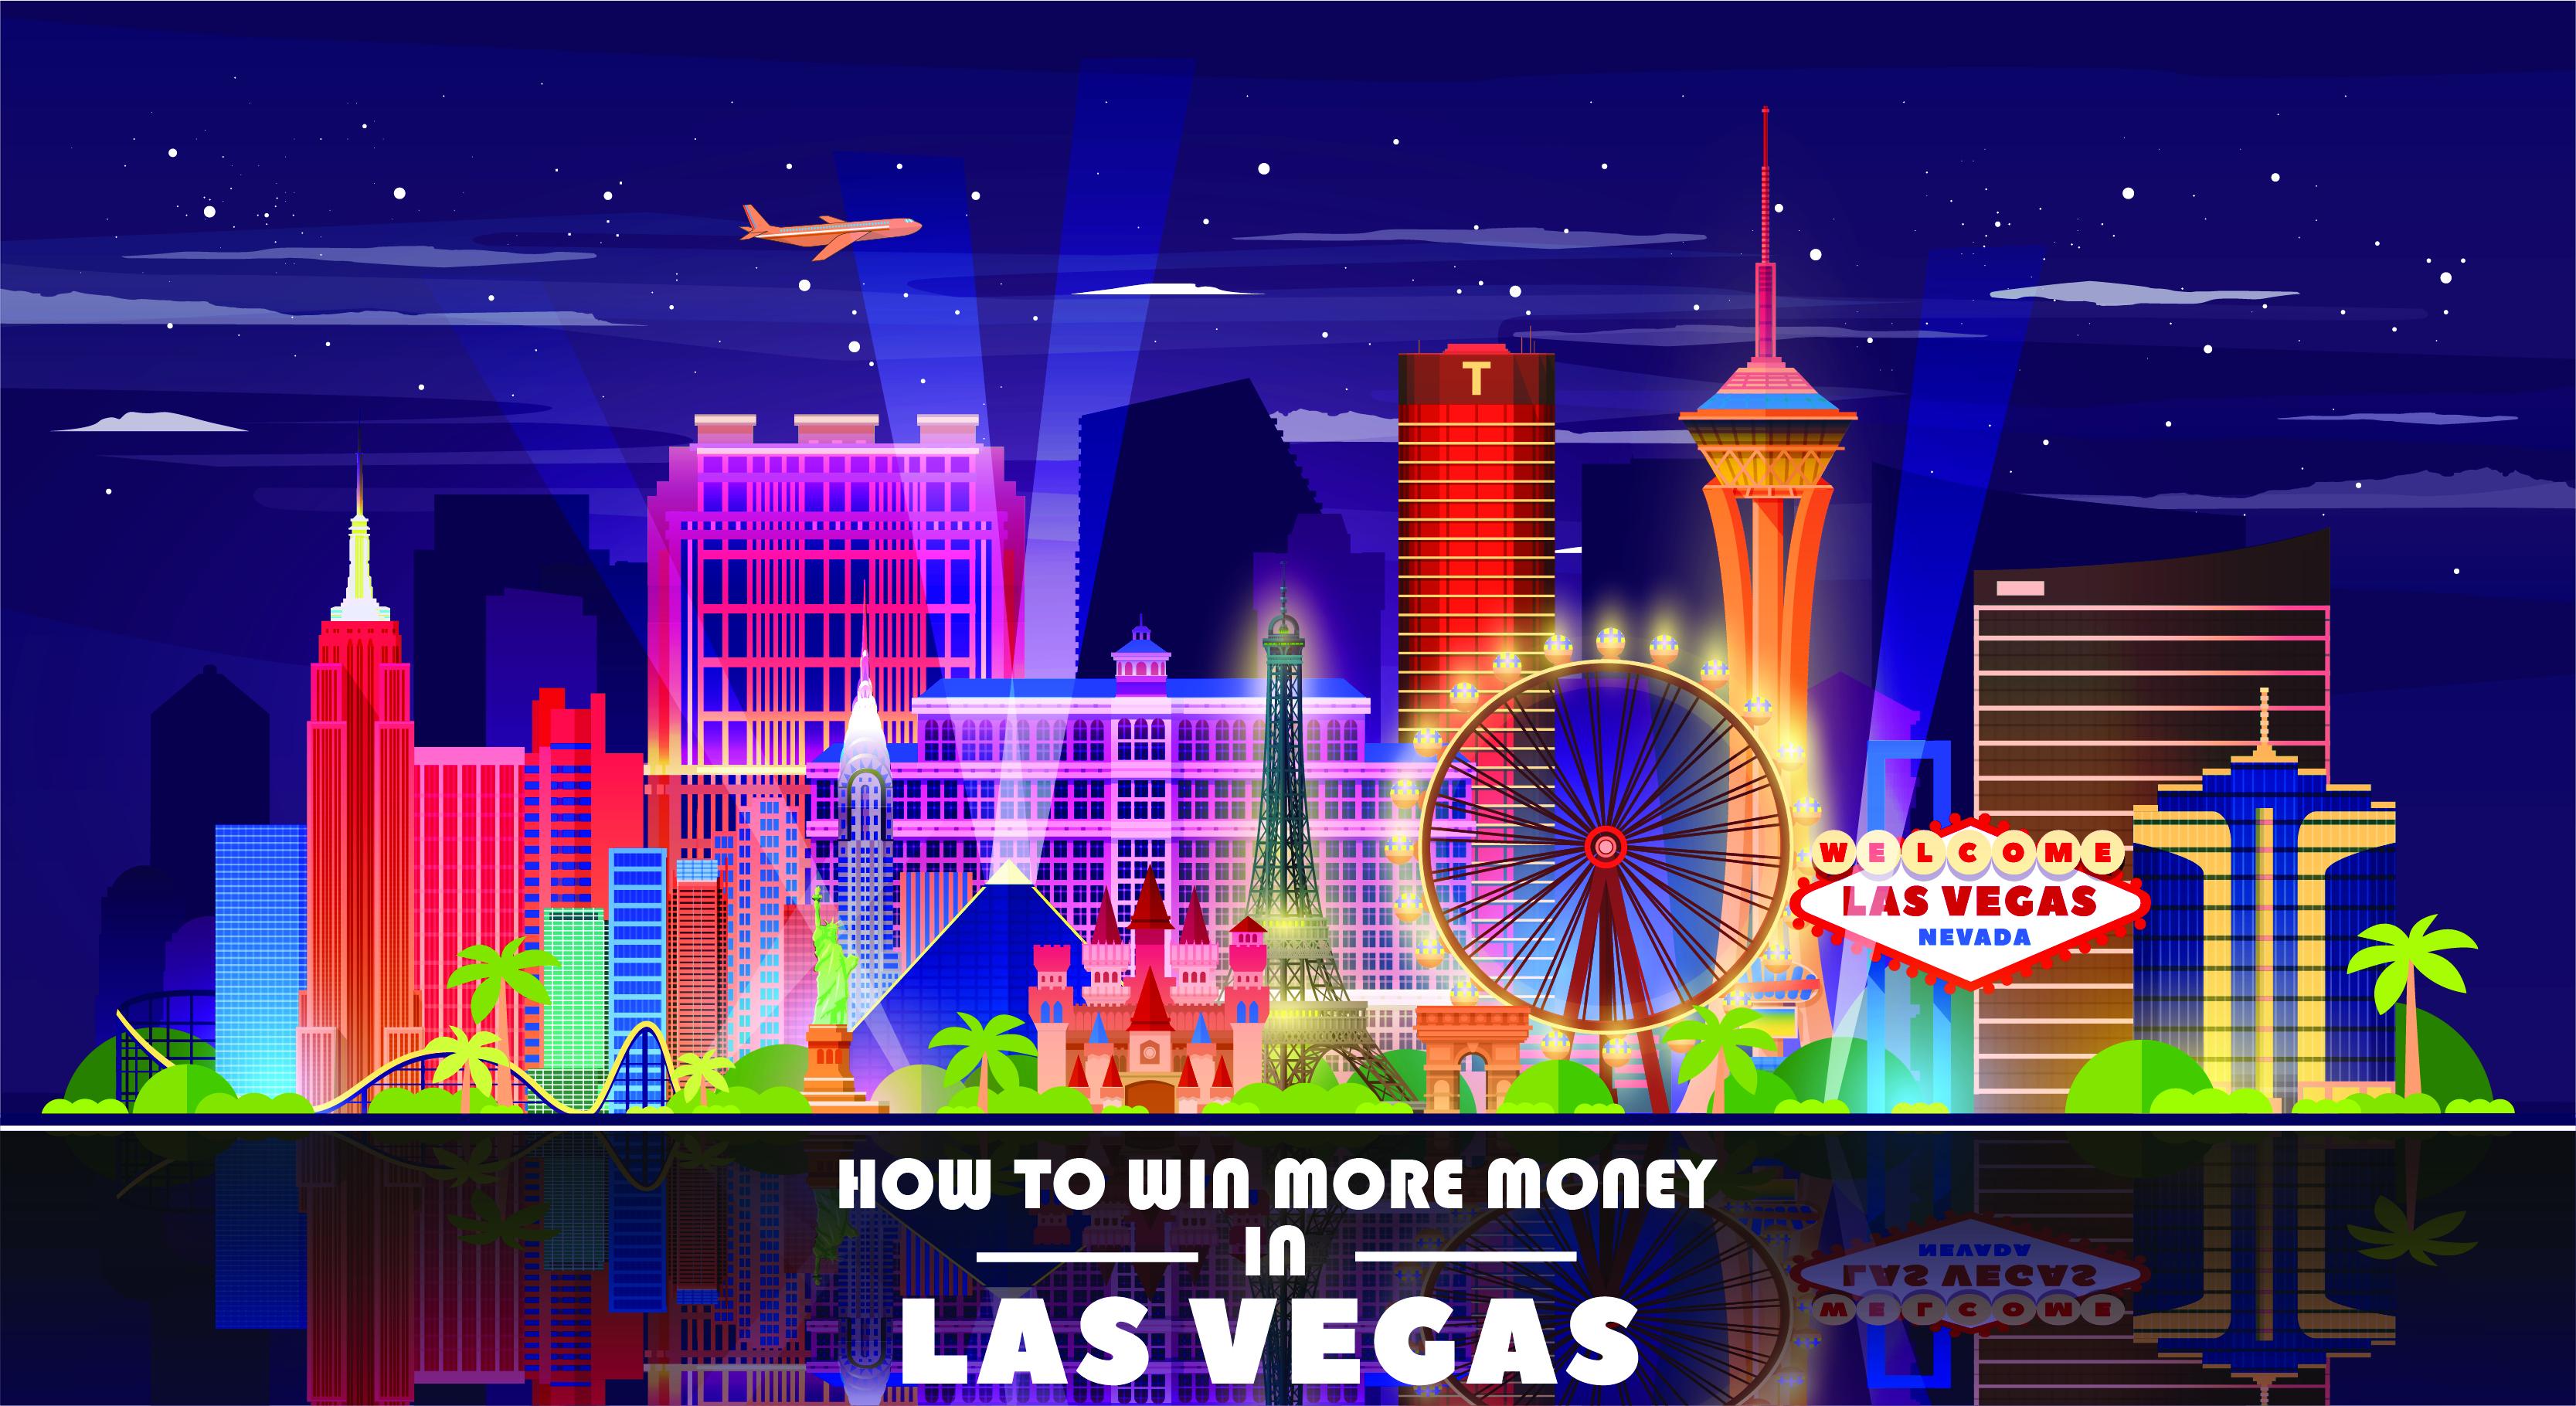 How to win more money in Las Vegas